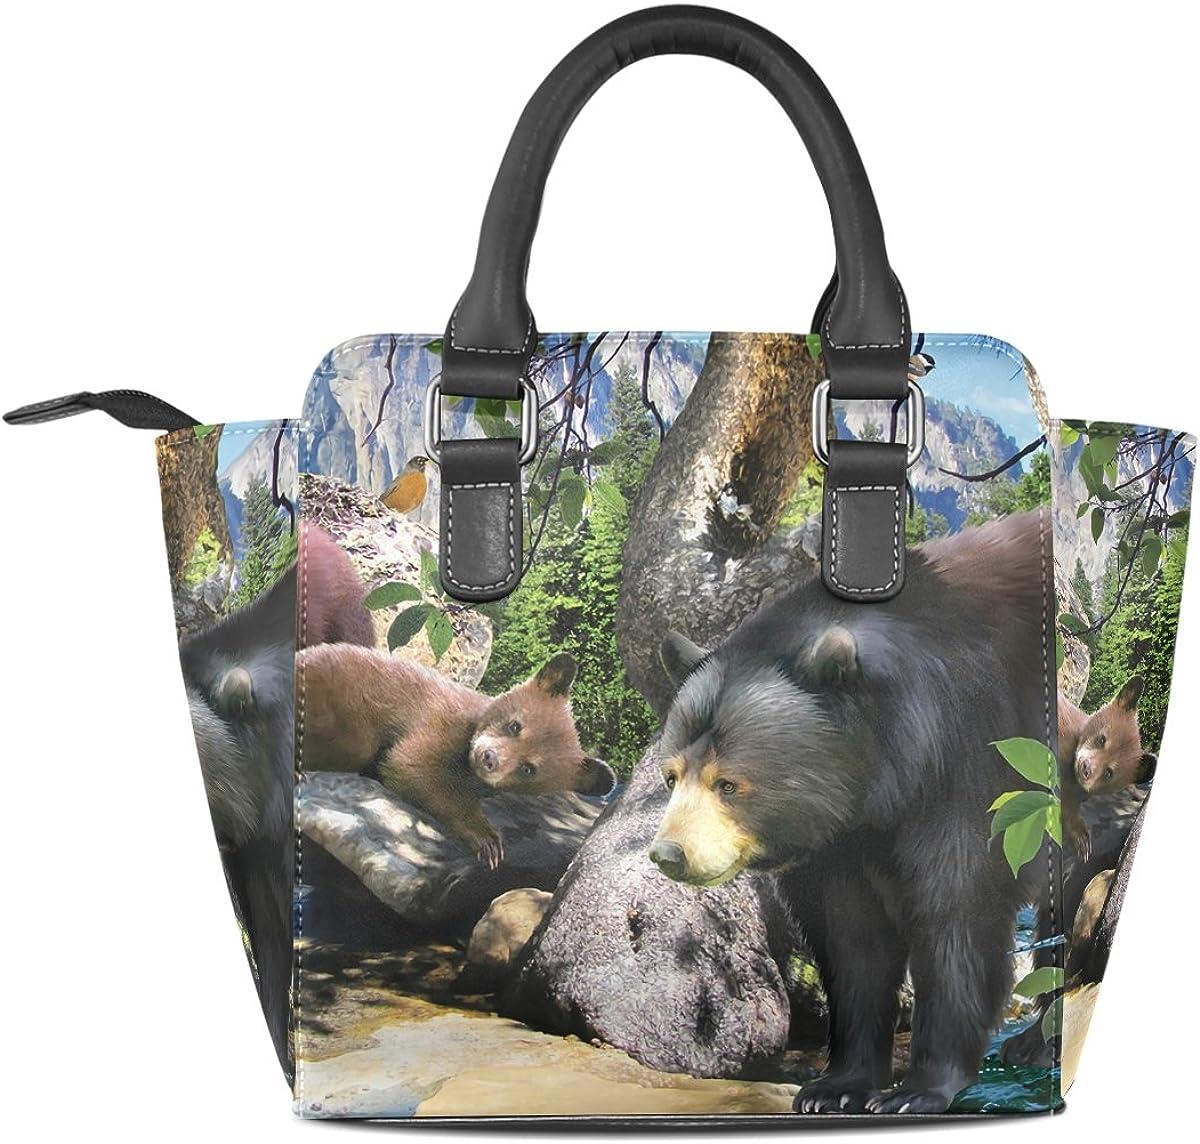 Jennifer PU Leather Top-Handle Handbags Cool Black Bears Art Single-Shoulder Tote Crossbody Bag Messenger Bags For Women